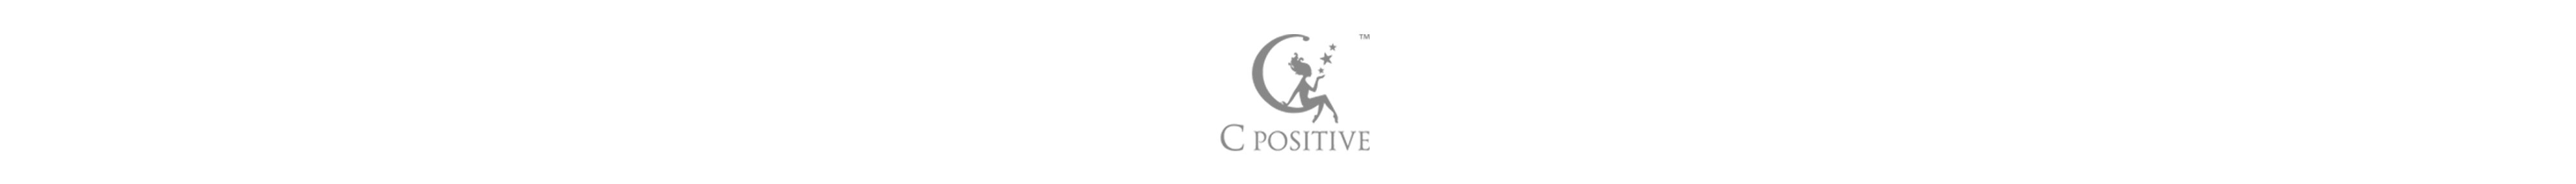 CPOSITIVE